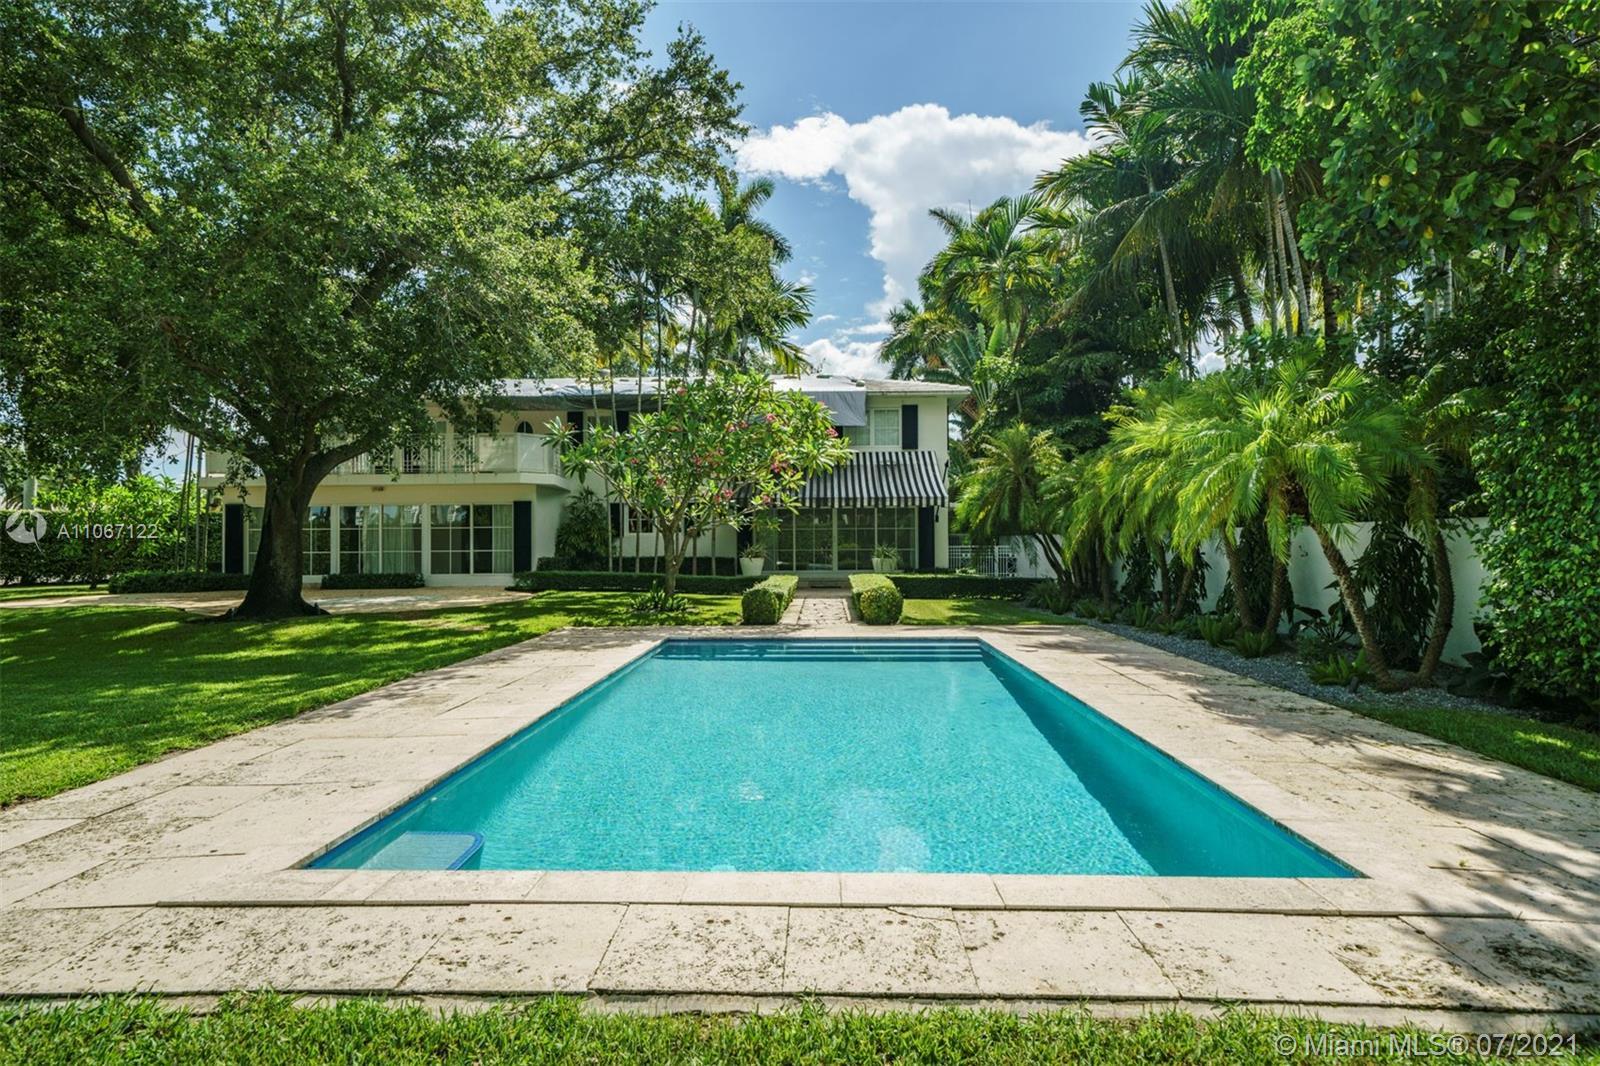 6605 Pinetree Ln, Miami Beach, FL 33141